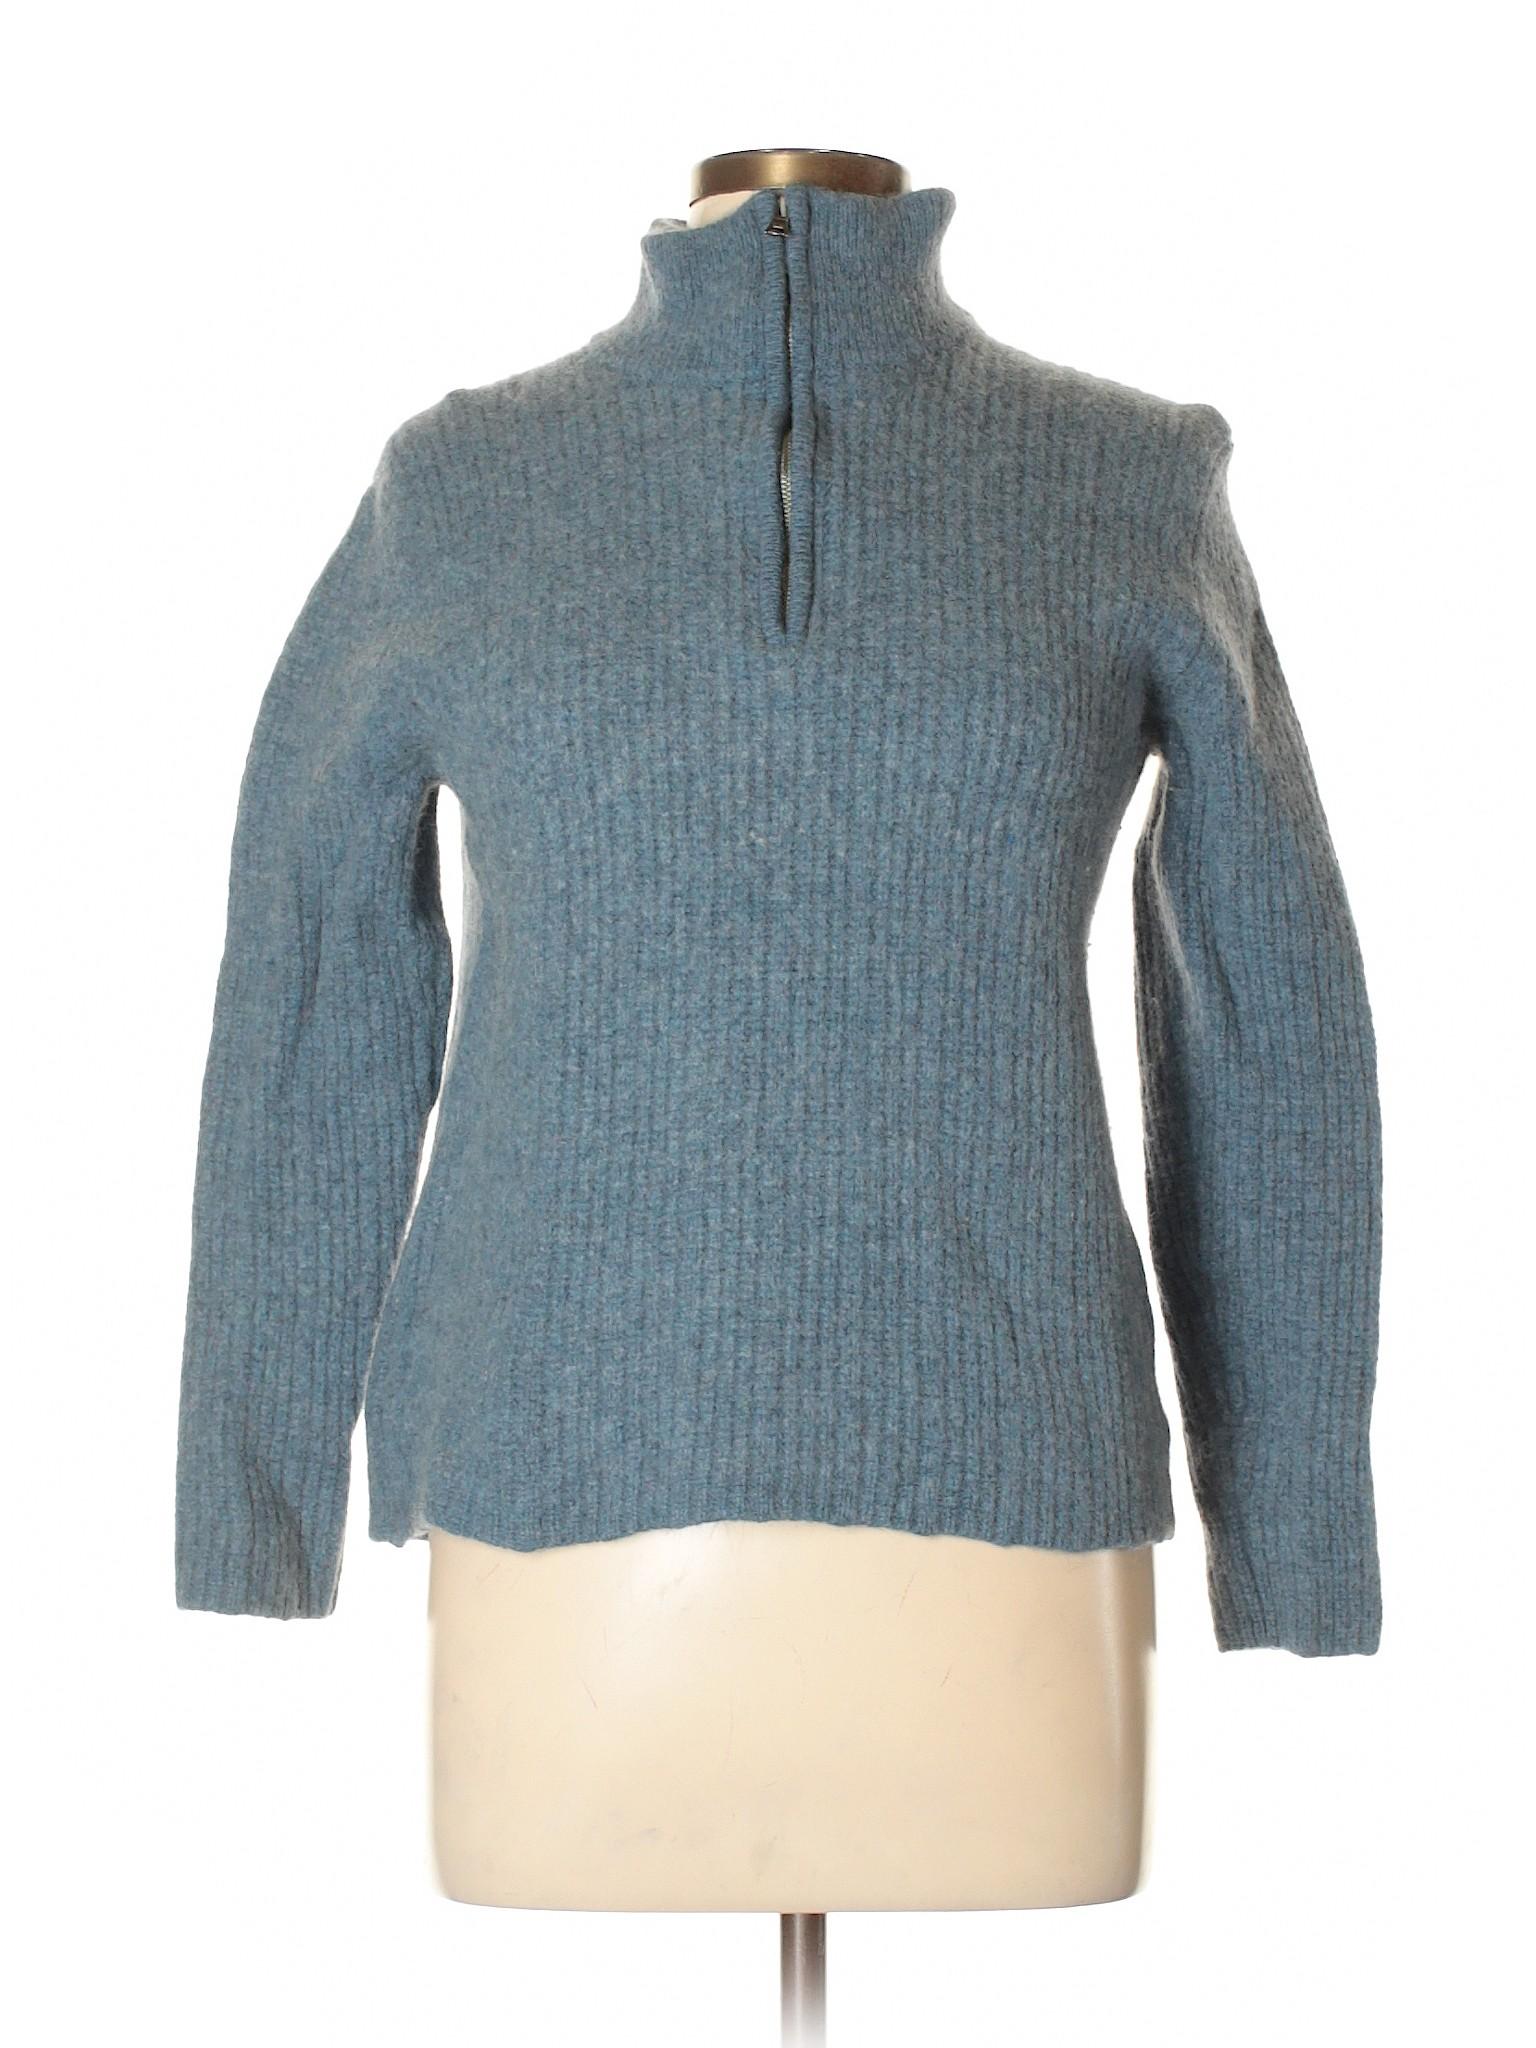 Republic Banana winter Wool Boutique Sweater Pullover qCfAWwp